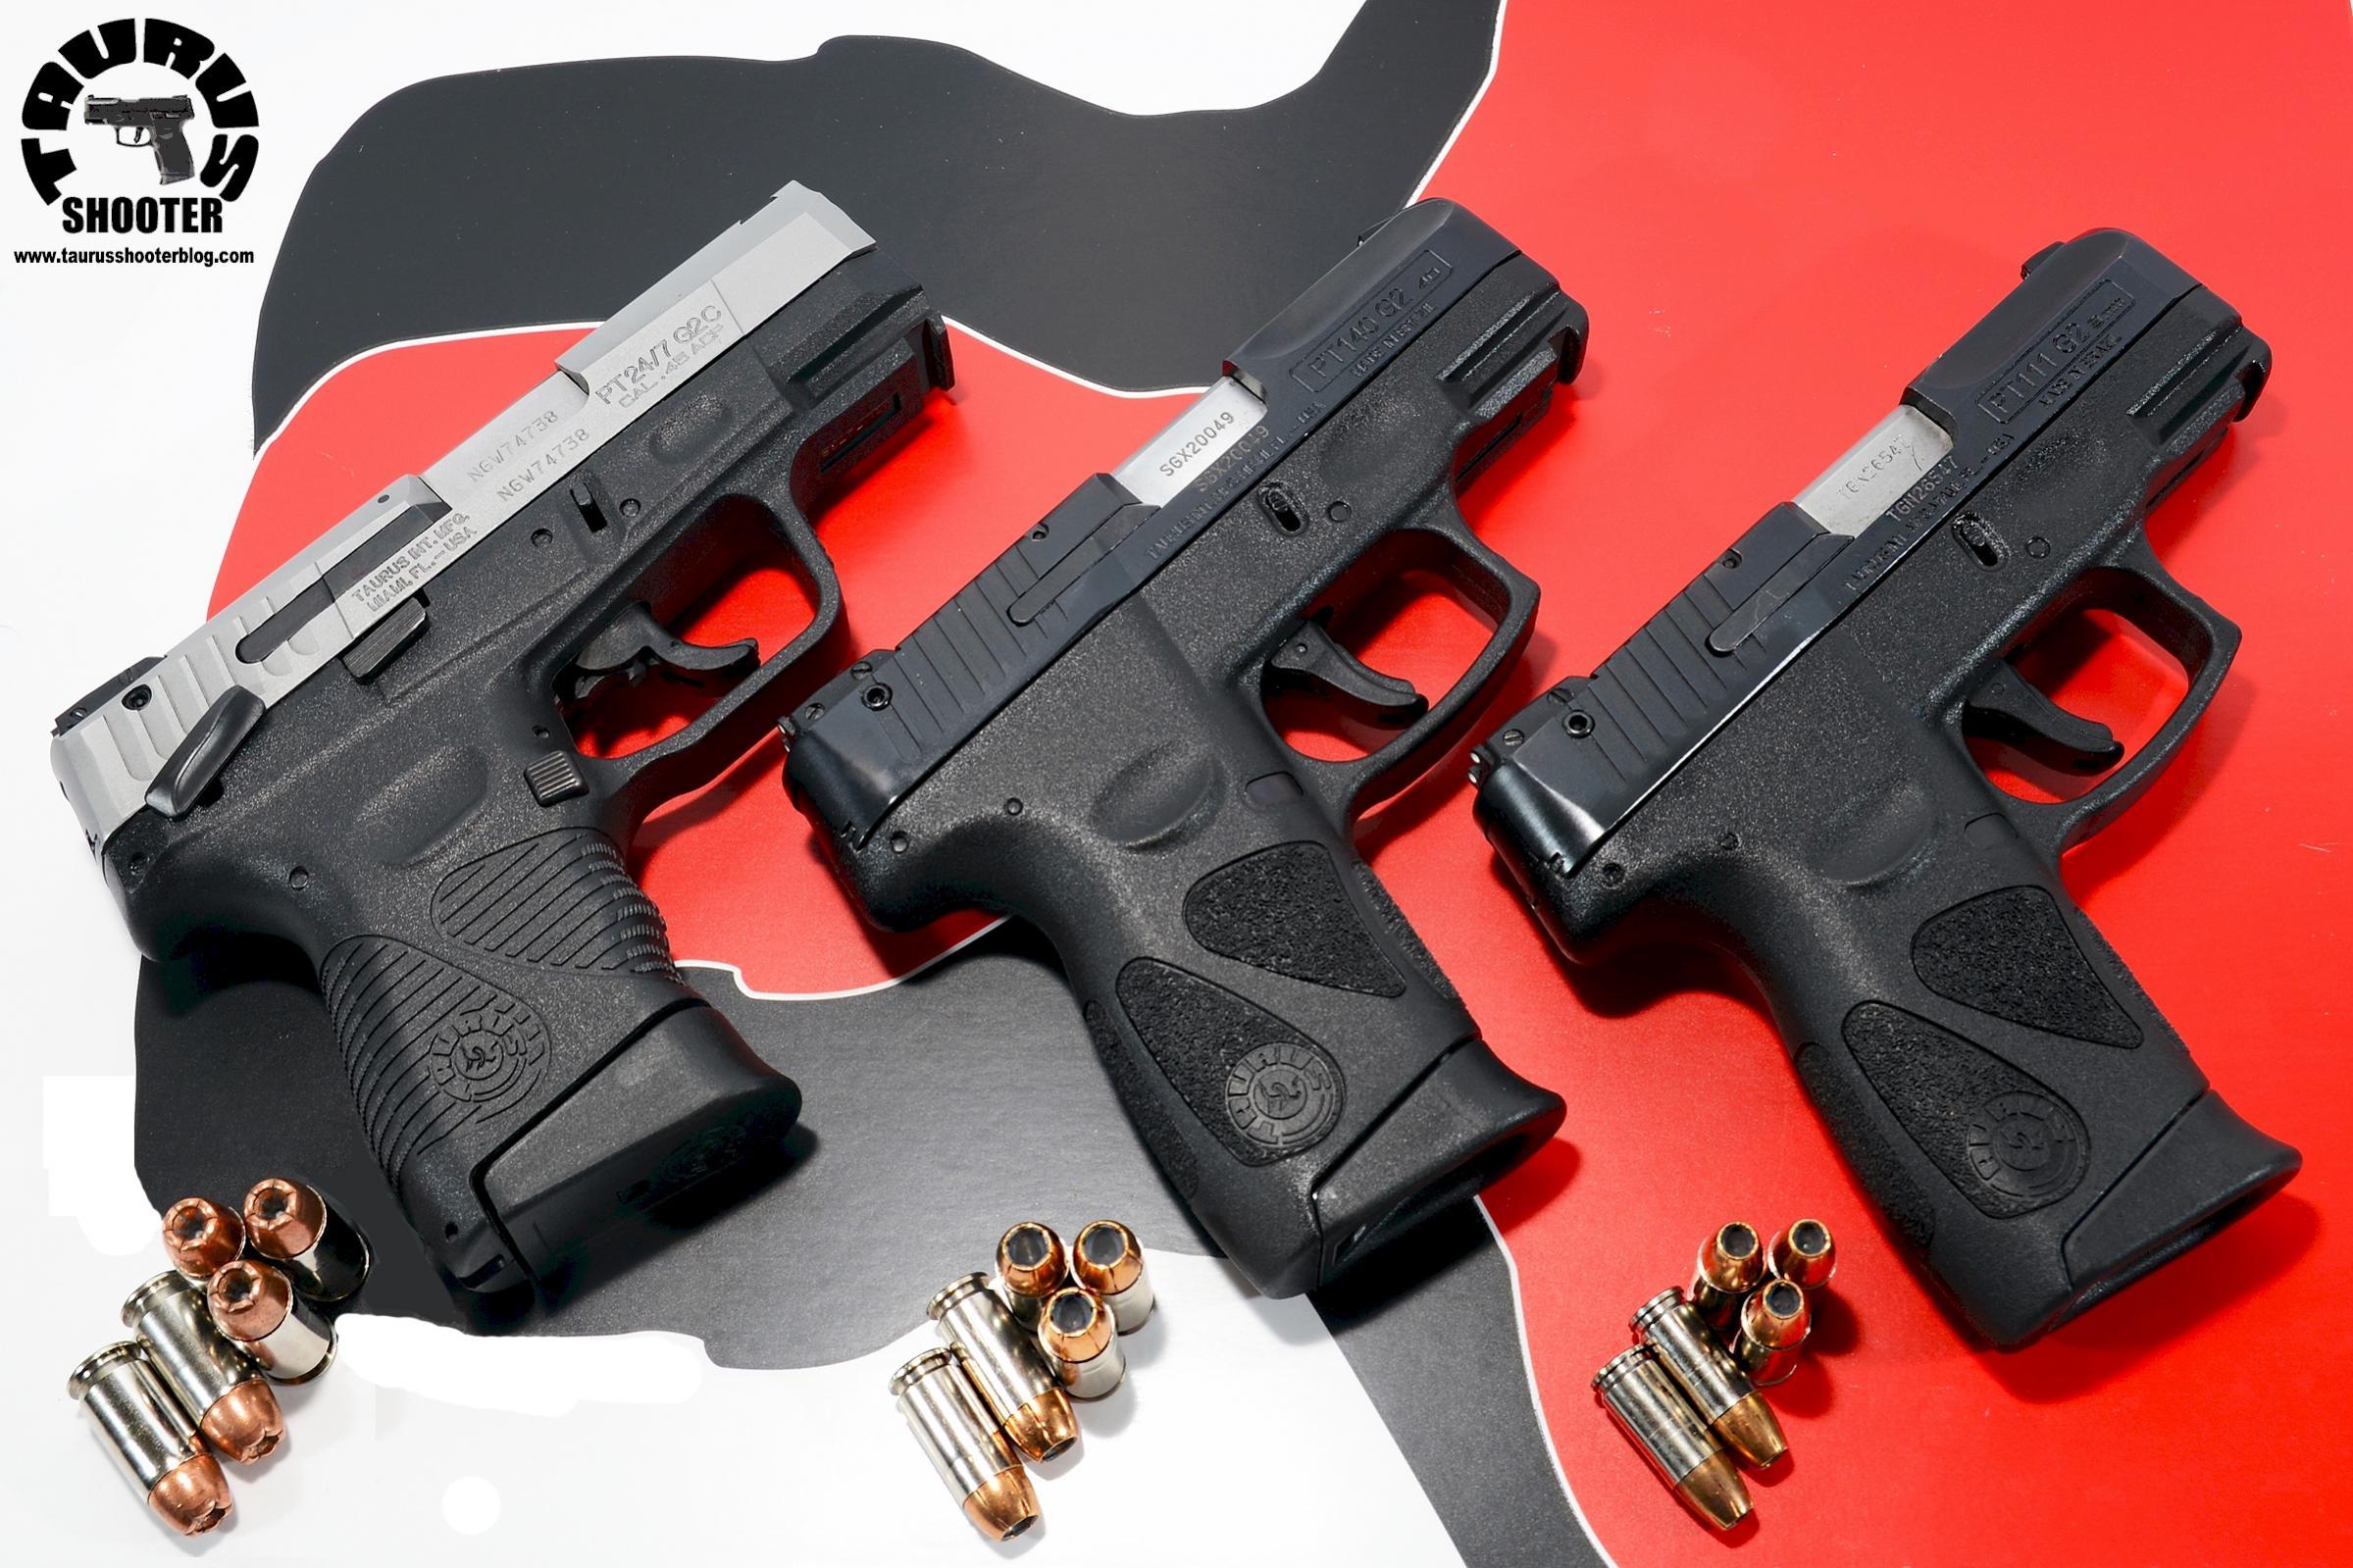 Taurus PT24/7 G2 45ACP Compact Pistol Range Report